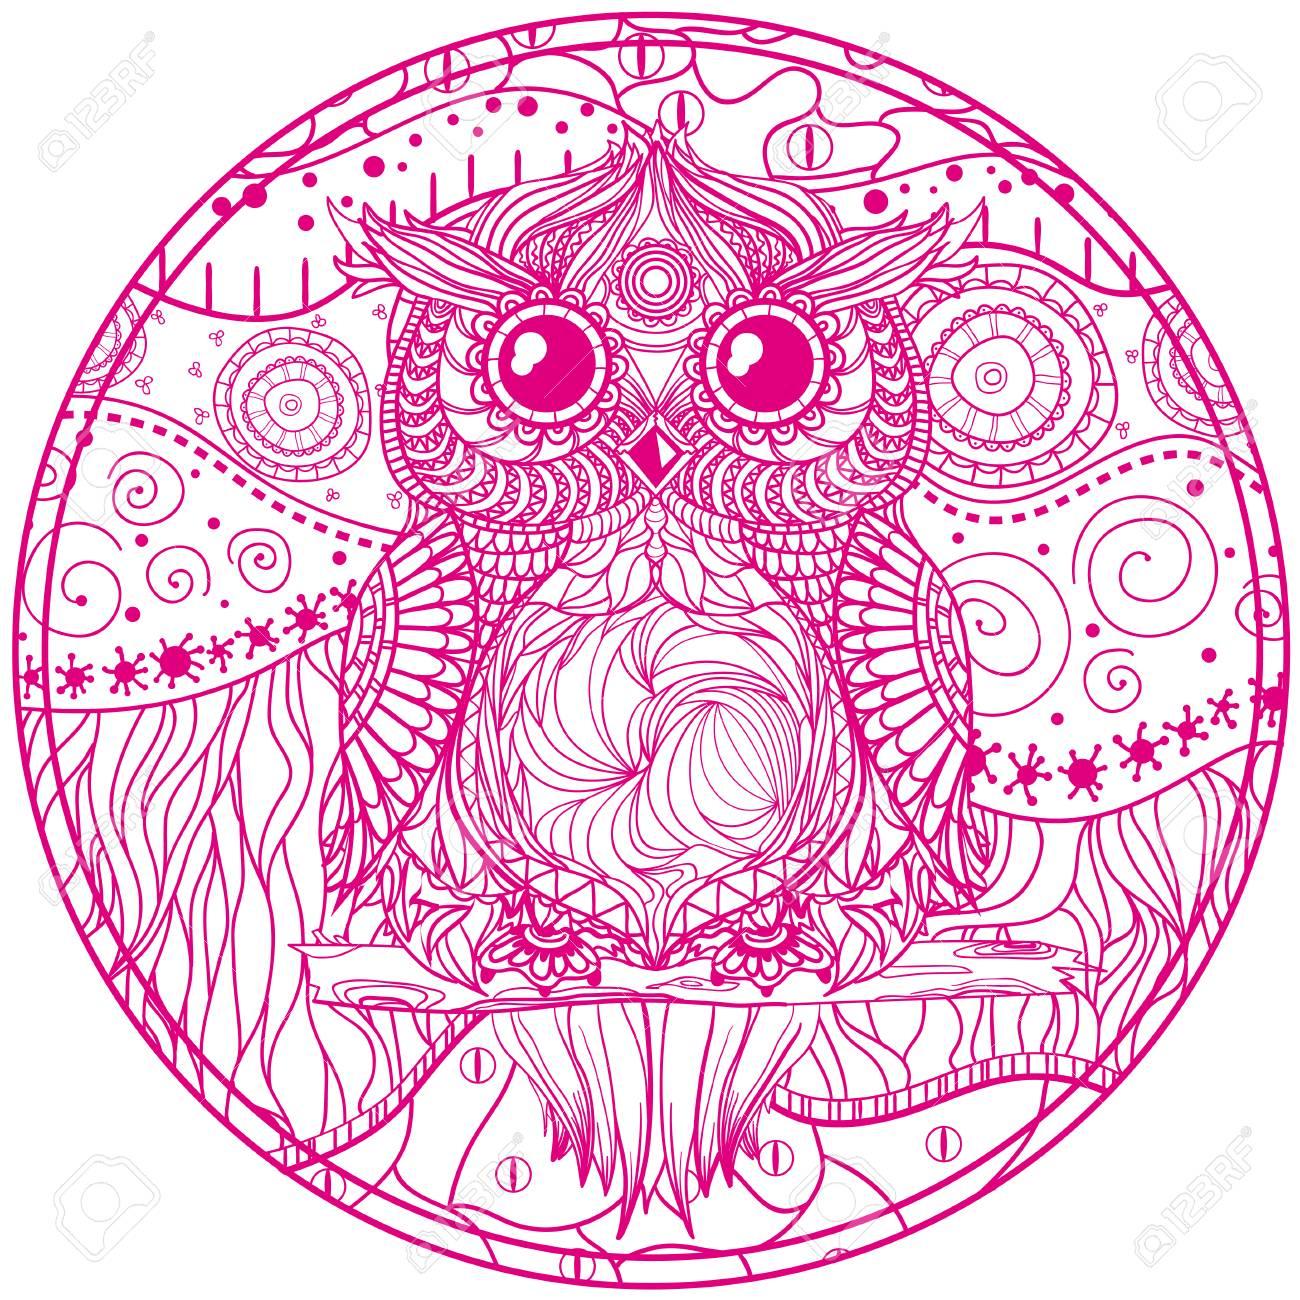 Mandala with owl design zentangle hand drawn abstract patterns mandala with owl design zentangle hand drawn abstract patterns on isolation background design biocorpaavc Choice Image